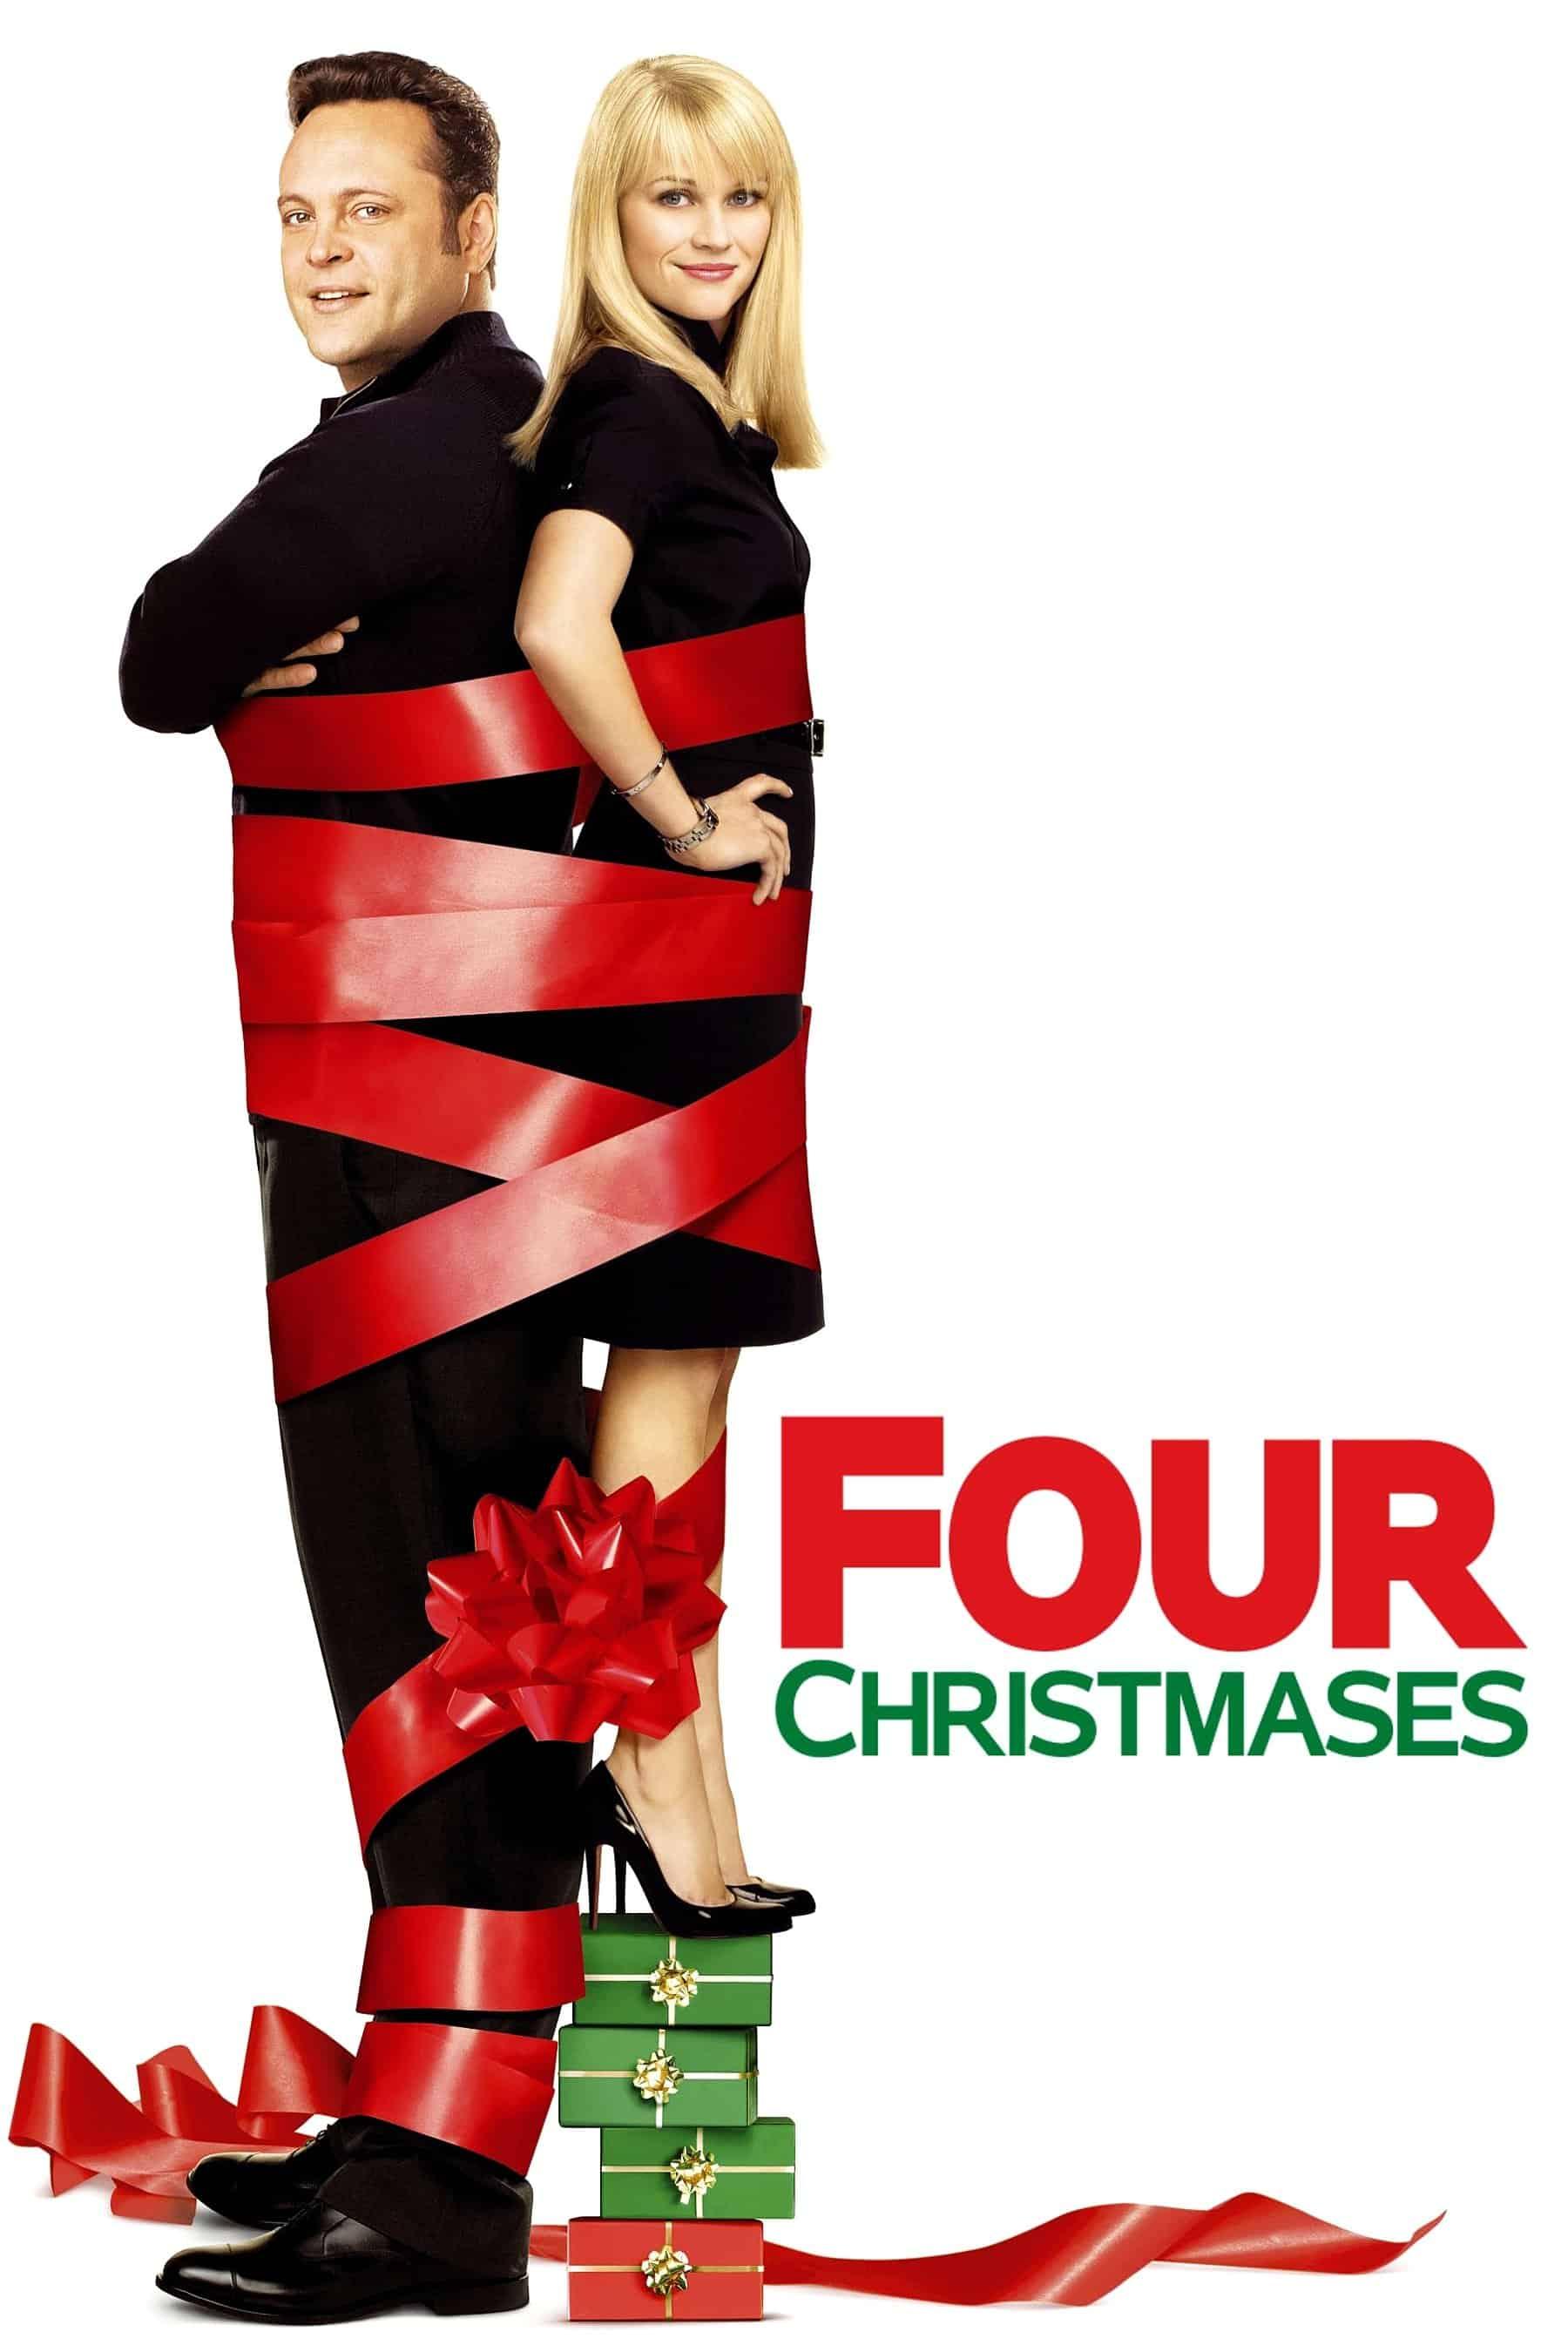 Four Christmases, 2008